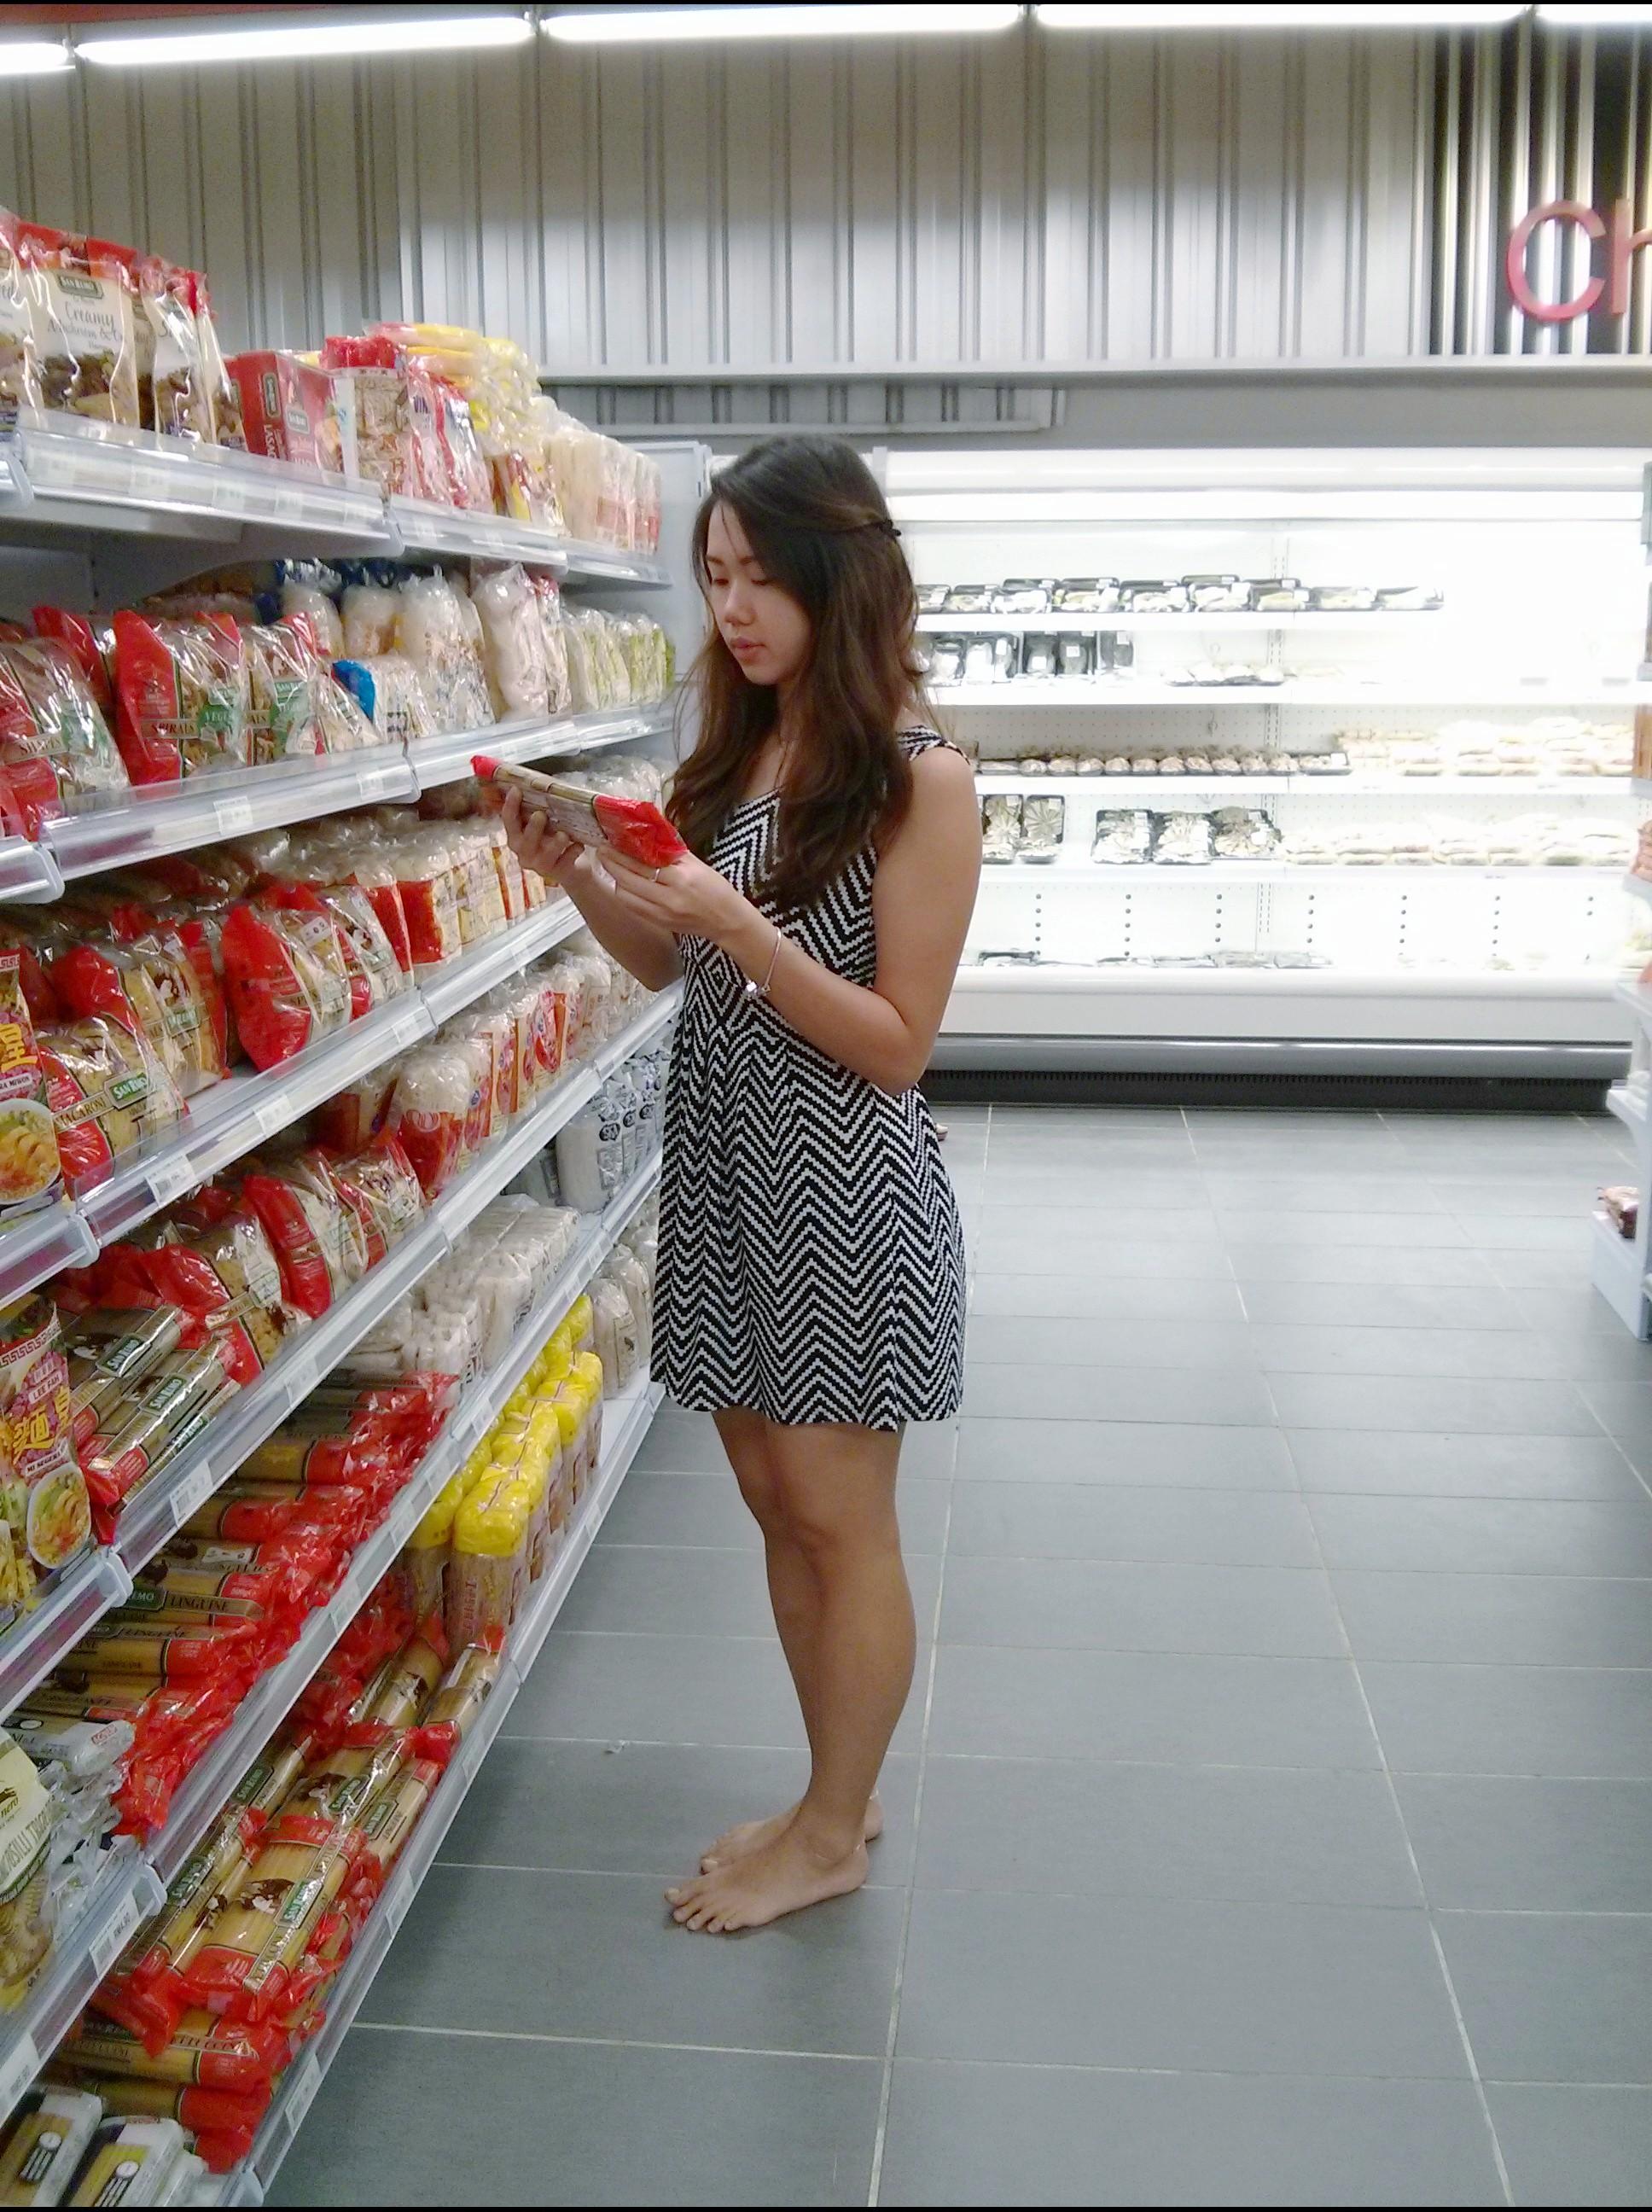 https://upload.wikimedia.org/wikipedia/commons/7/71/Barefoot_women_in_supermarket2.jpg